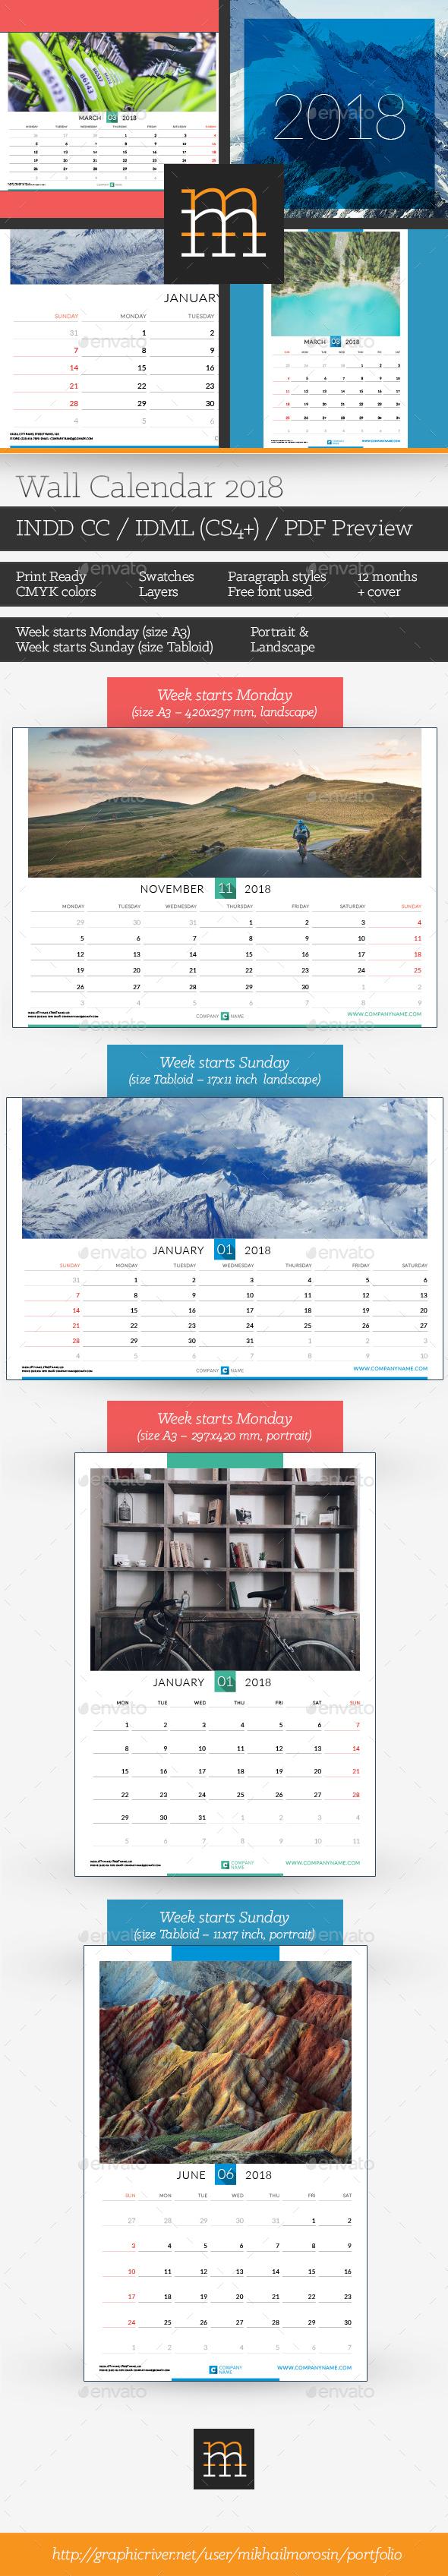 Wall Calendar 2018 - Calendars Stationery